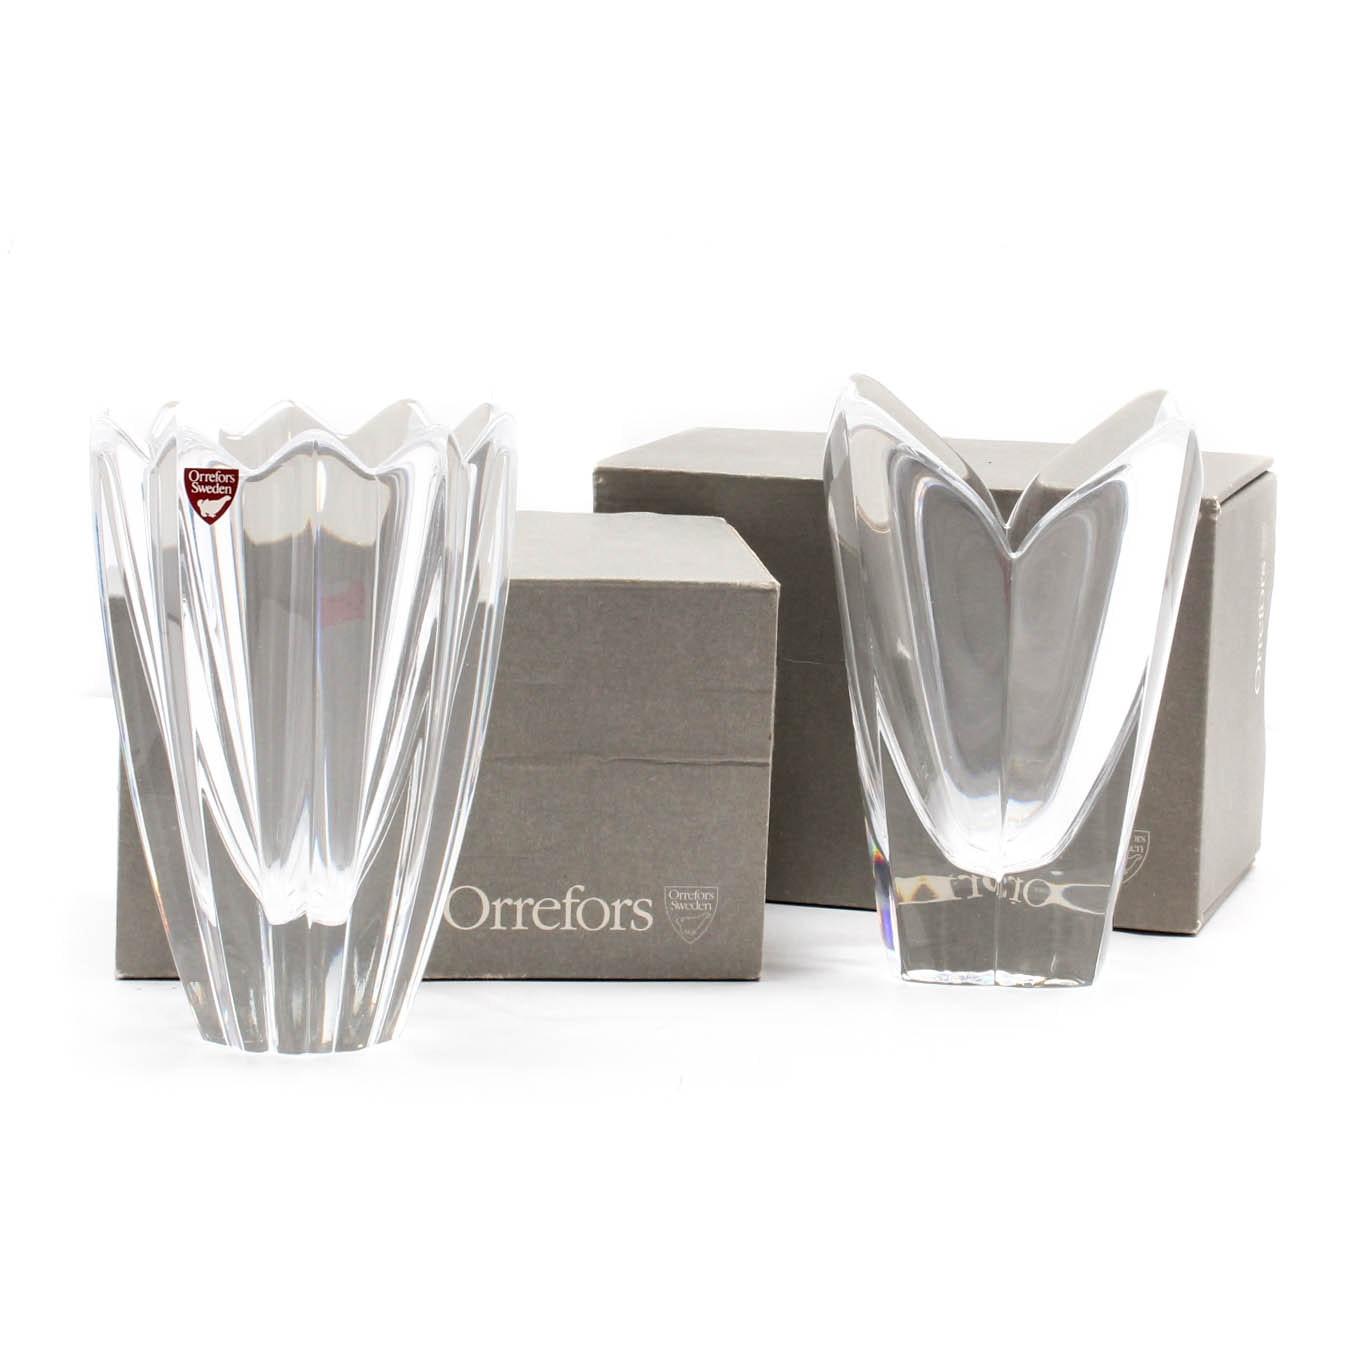 "Orrefors ""Lotus"" and ""Fleu"" Crystal Vases"